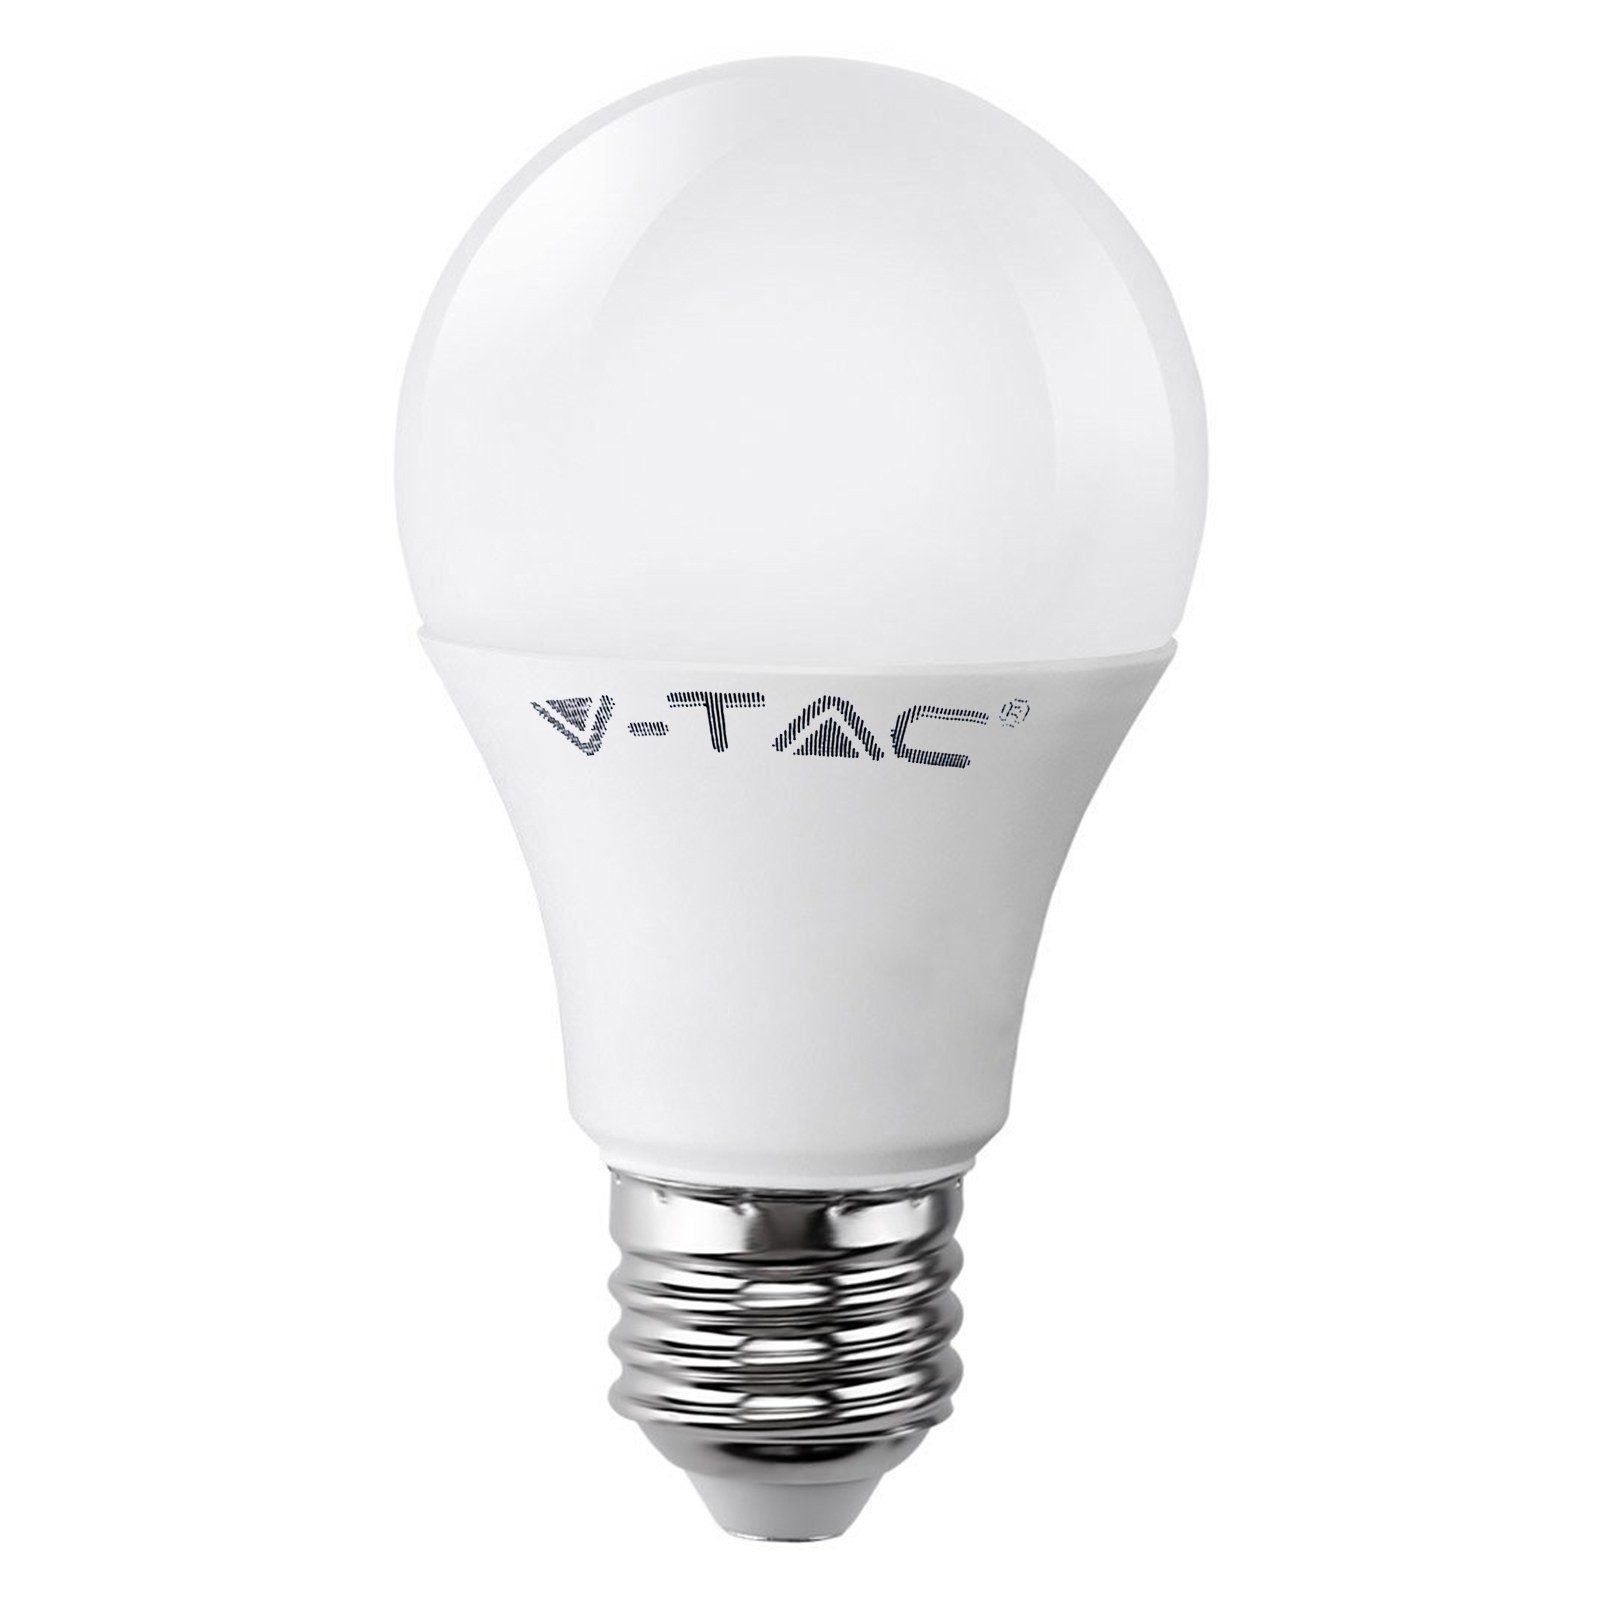 Lampadina Lampada LED Bulb V-TAC E27 VT-1853 10 Watt Luce Bianca Fredda 806 LM